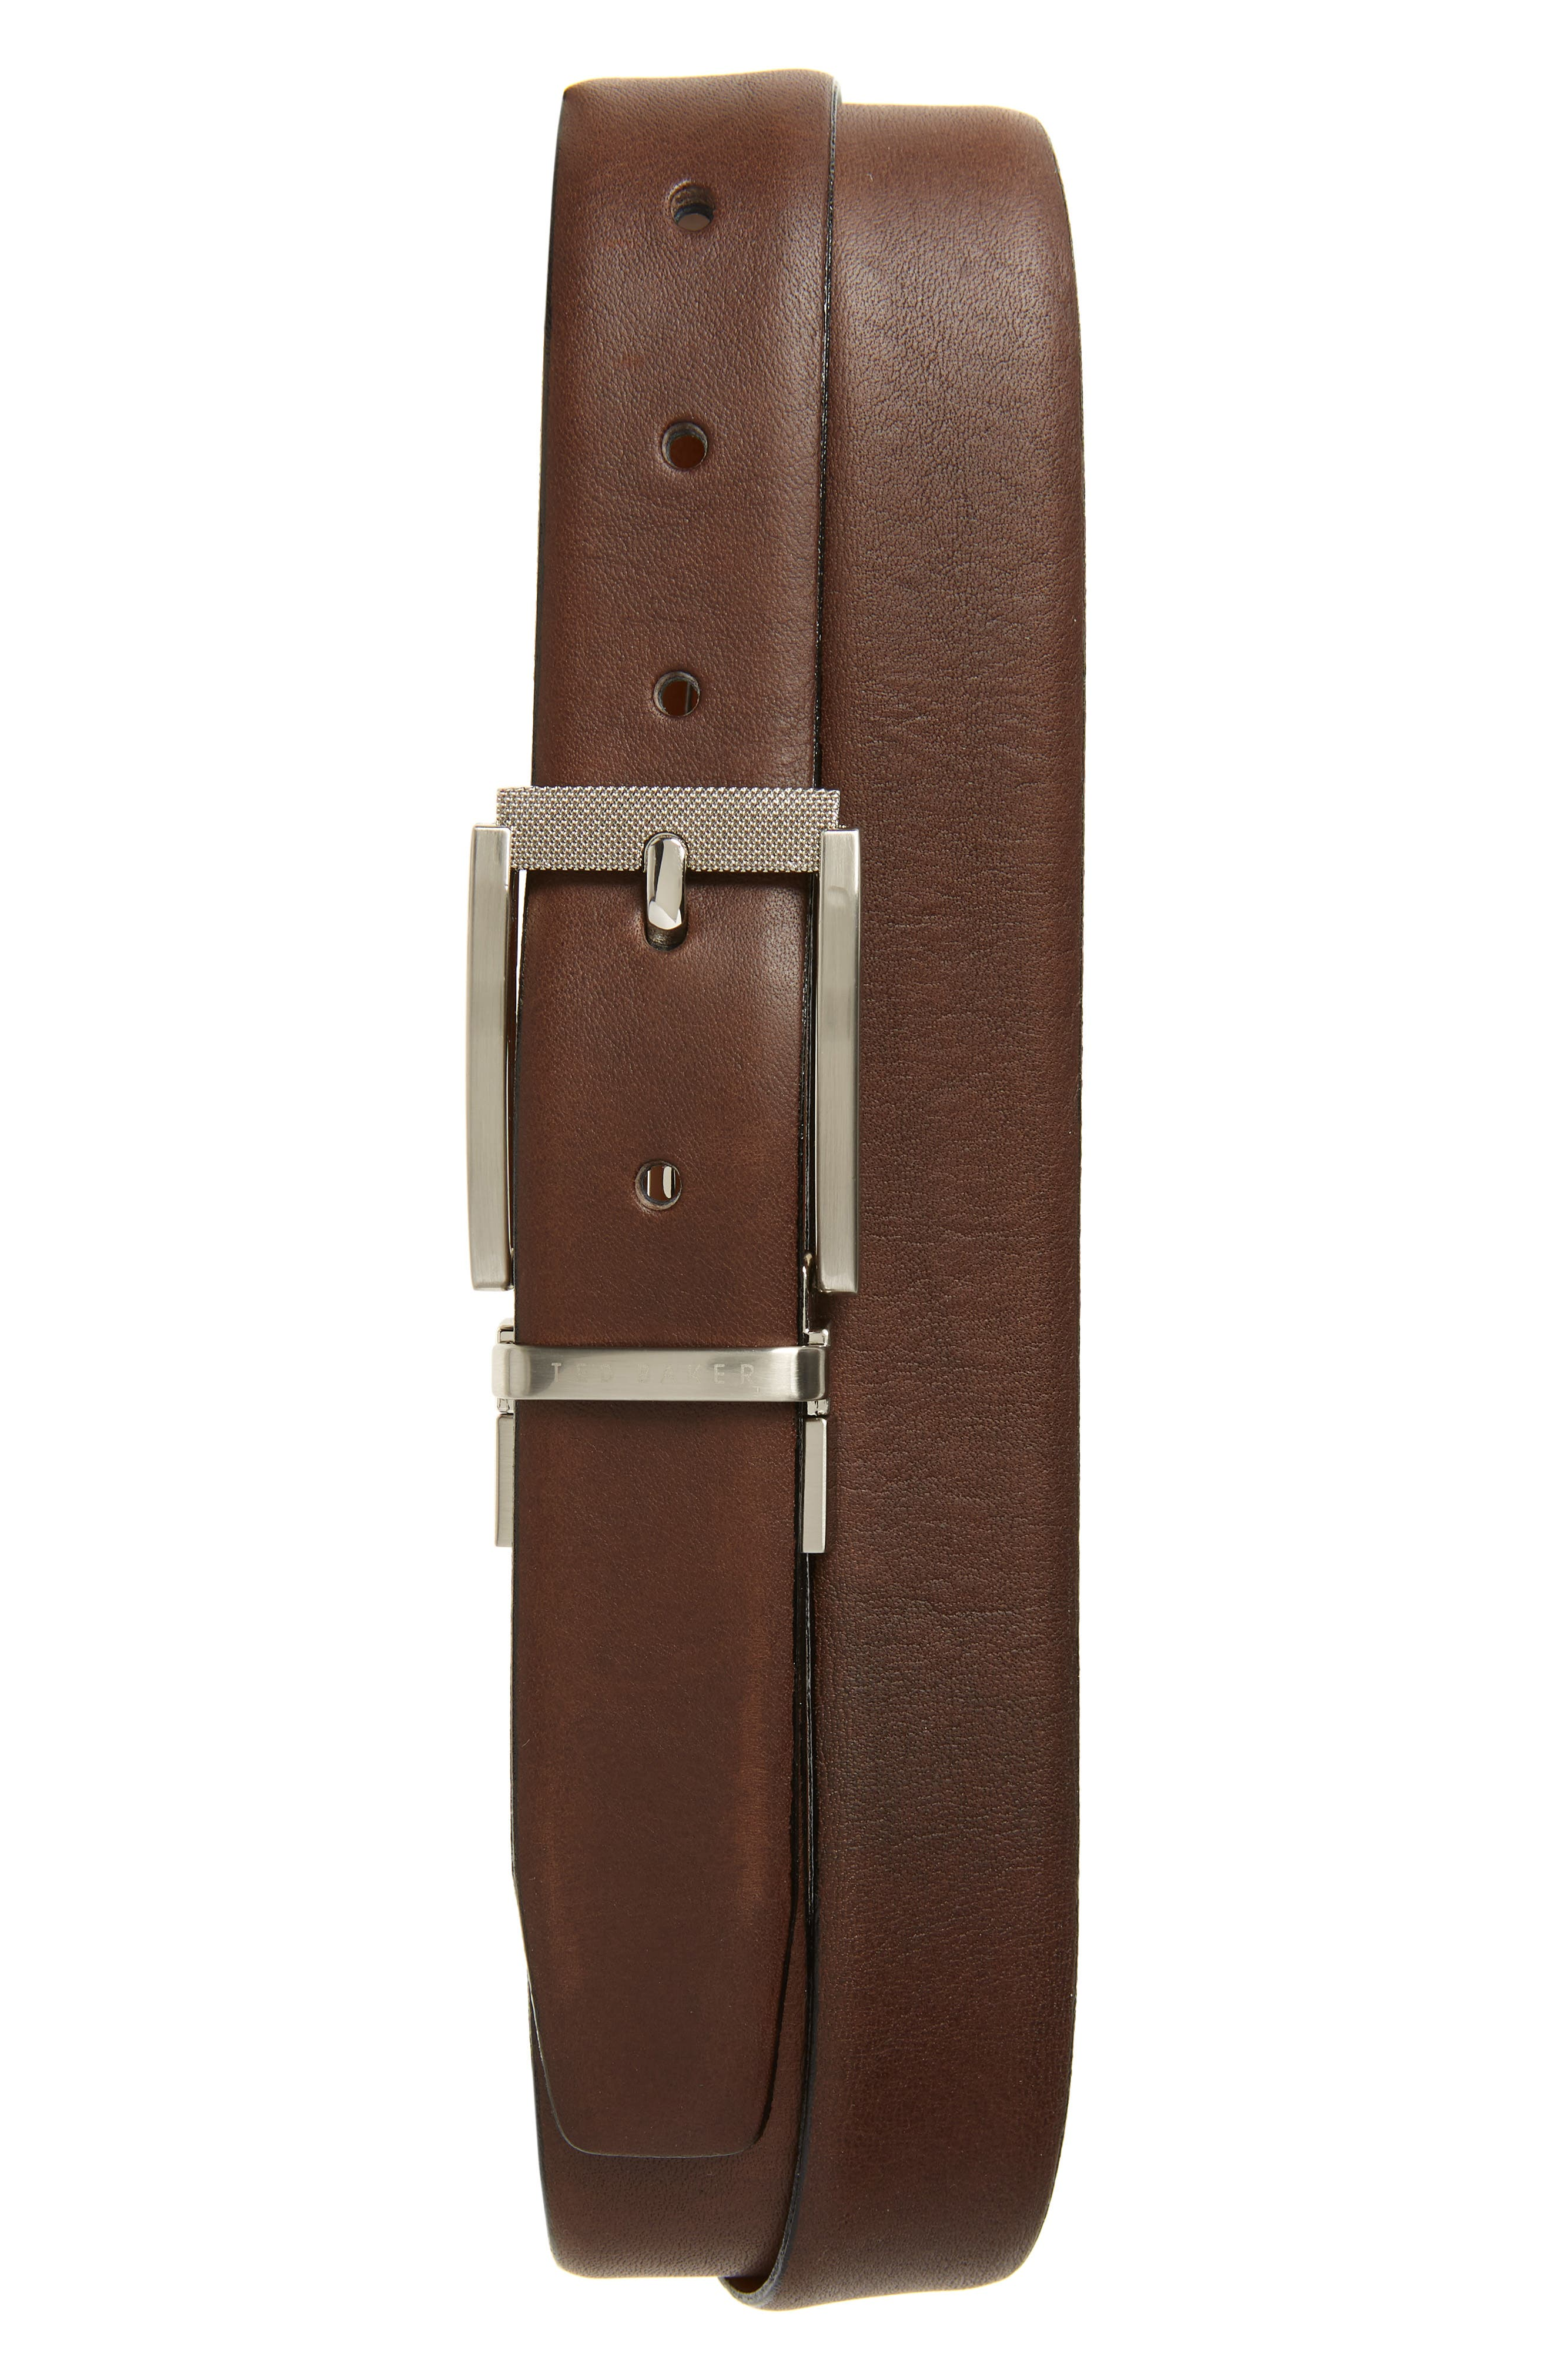 Ted Baker London Reva Reversible Leather Belt, Tan/ Chocolate